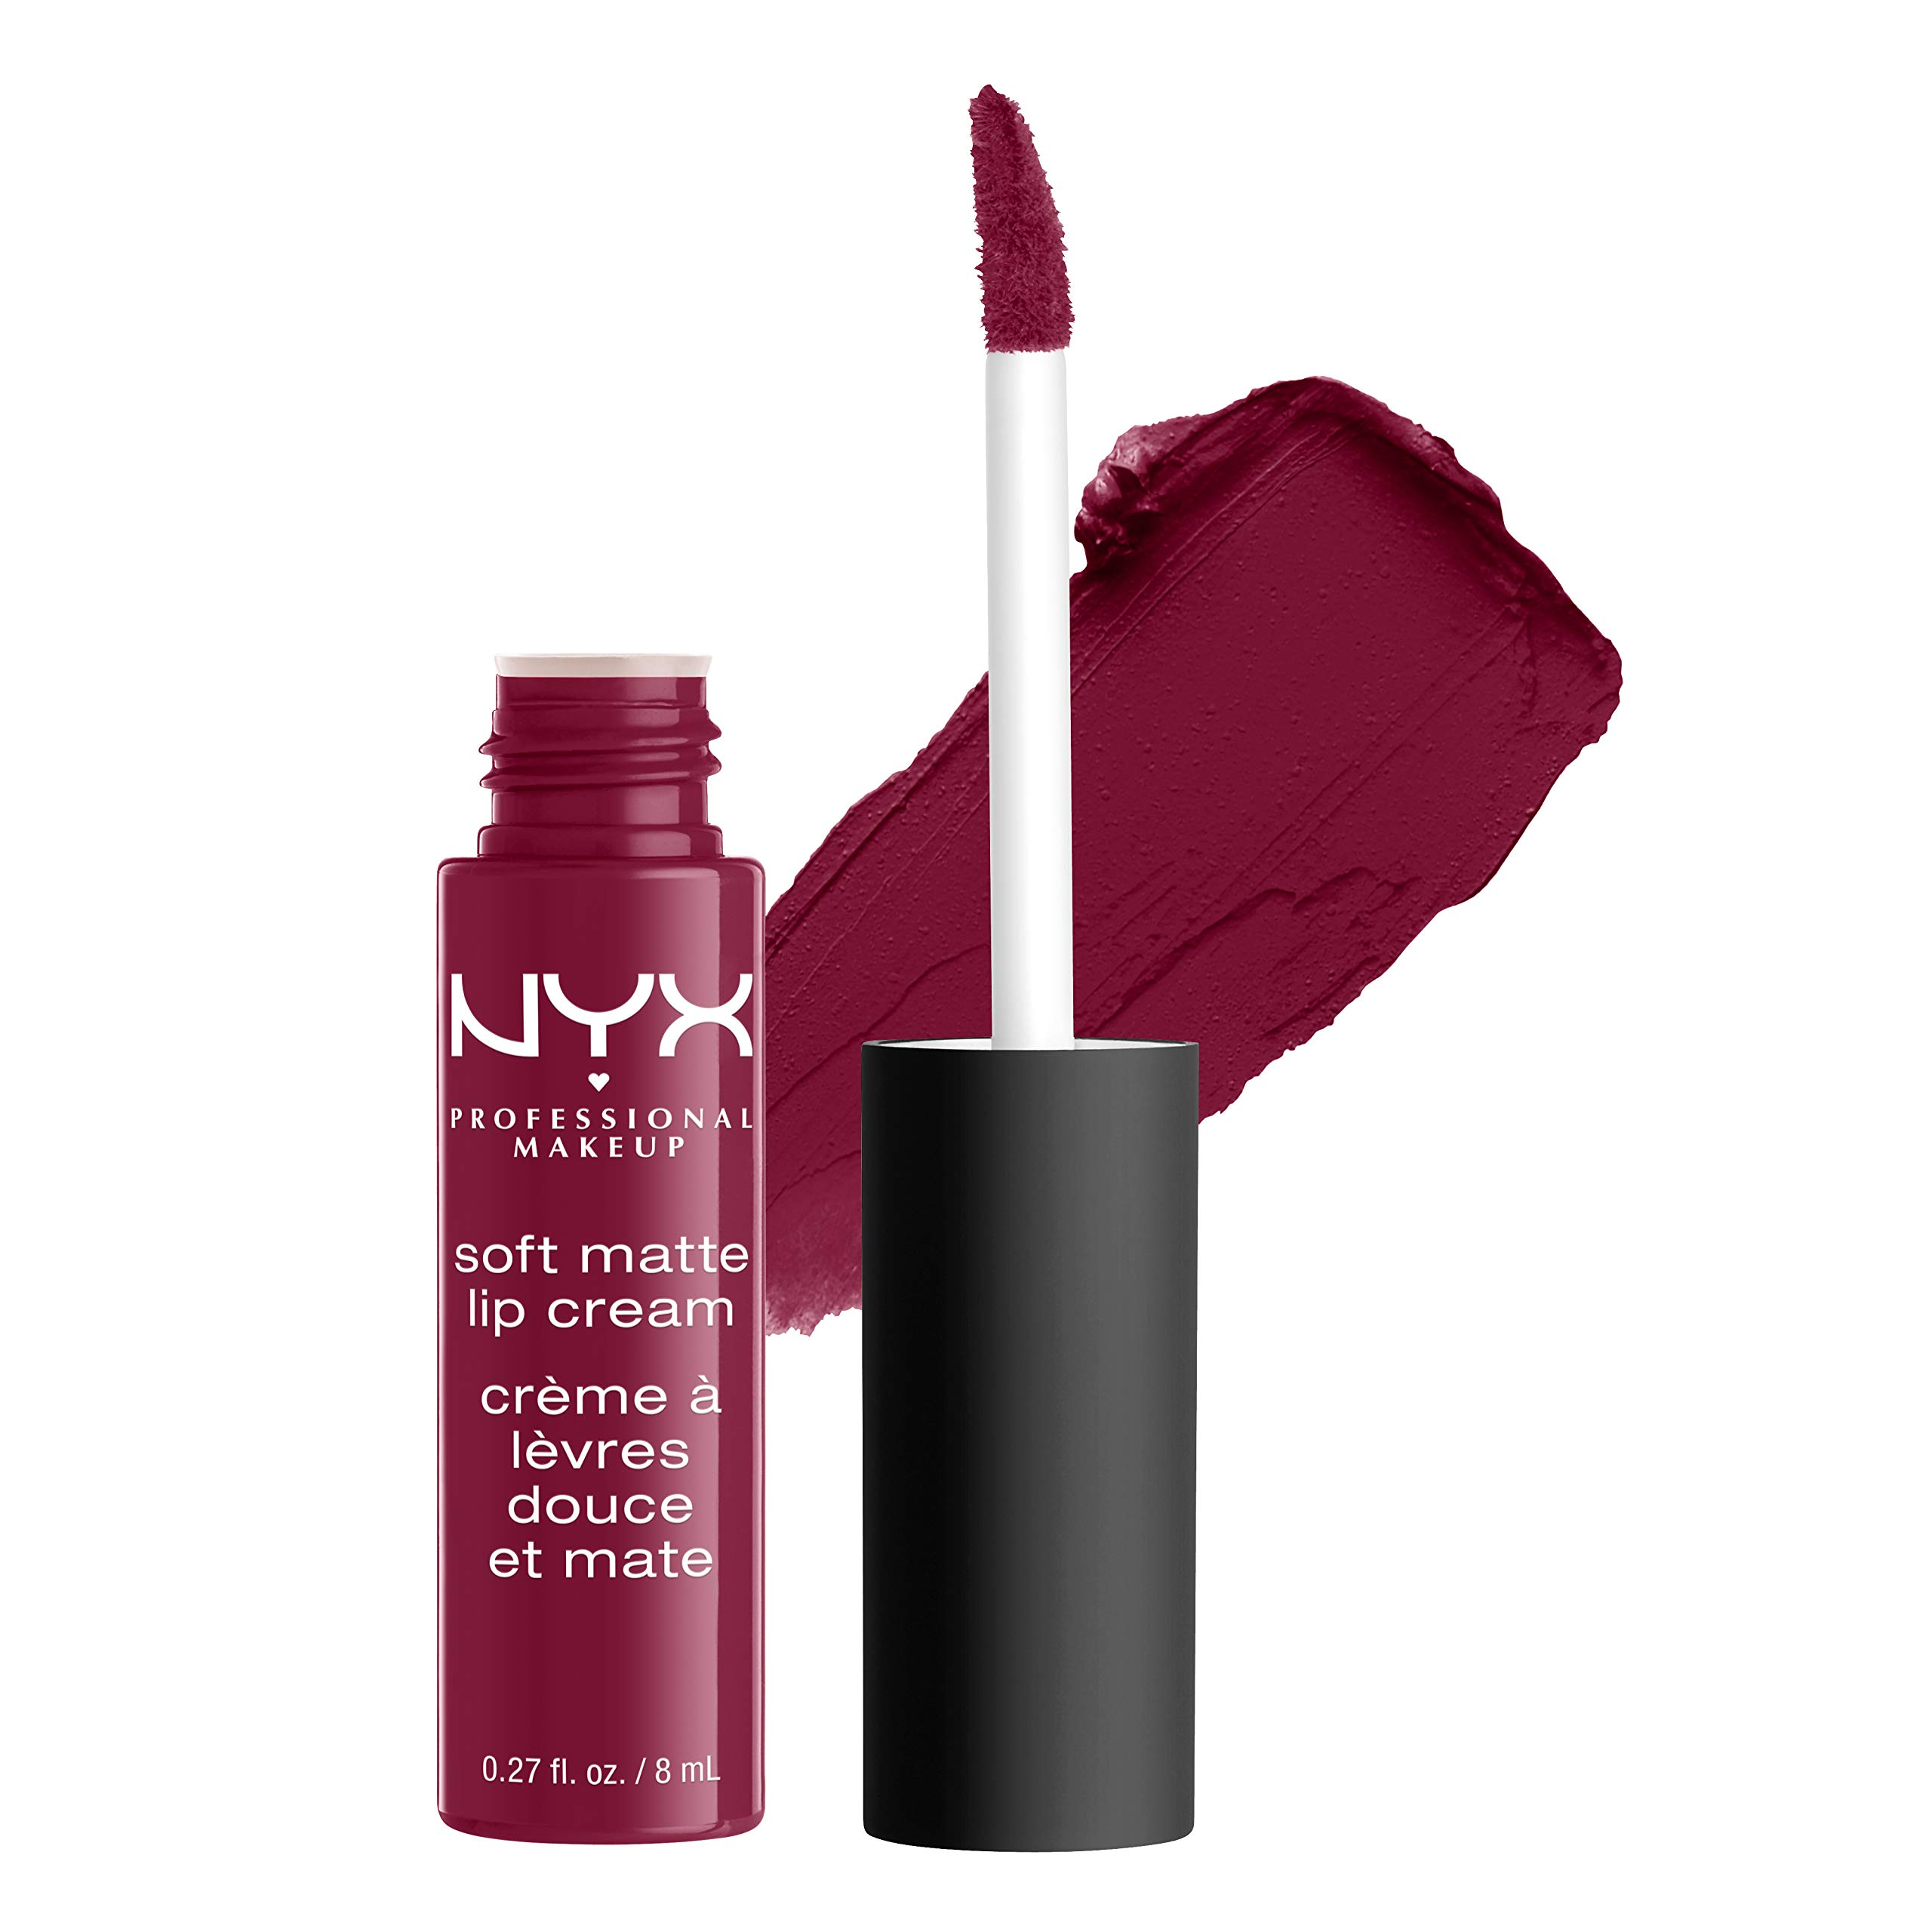 NYX PROFESSIONAL MAKEUP Soft Matte Lip Cream, High-Pigmented Cream Lipstick - Copenhagen, Matte Rich Plum